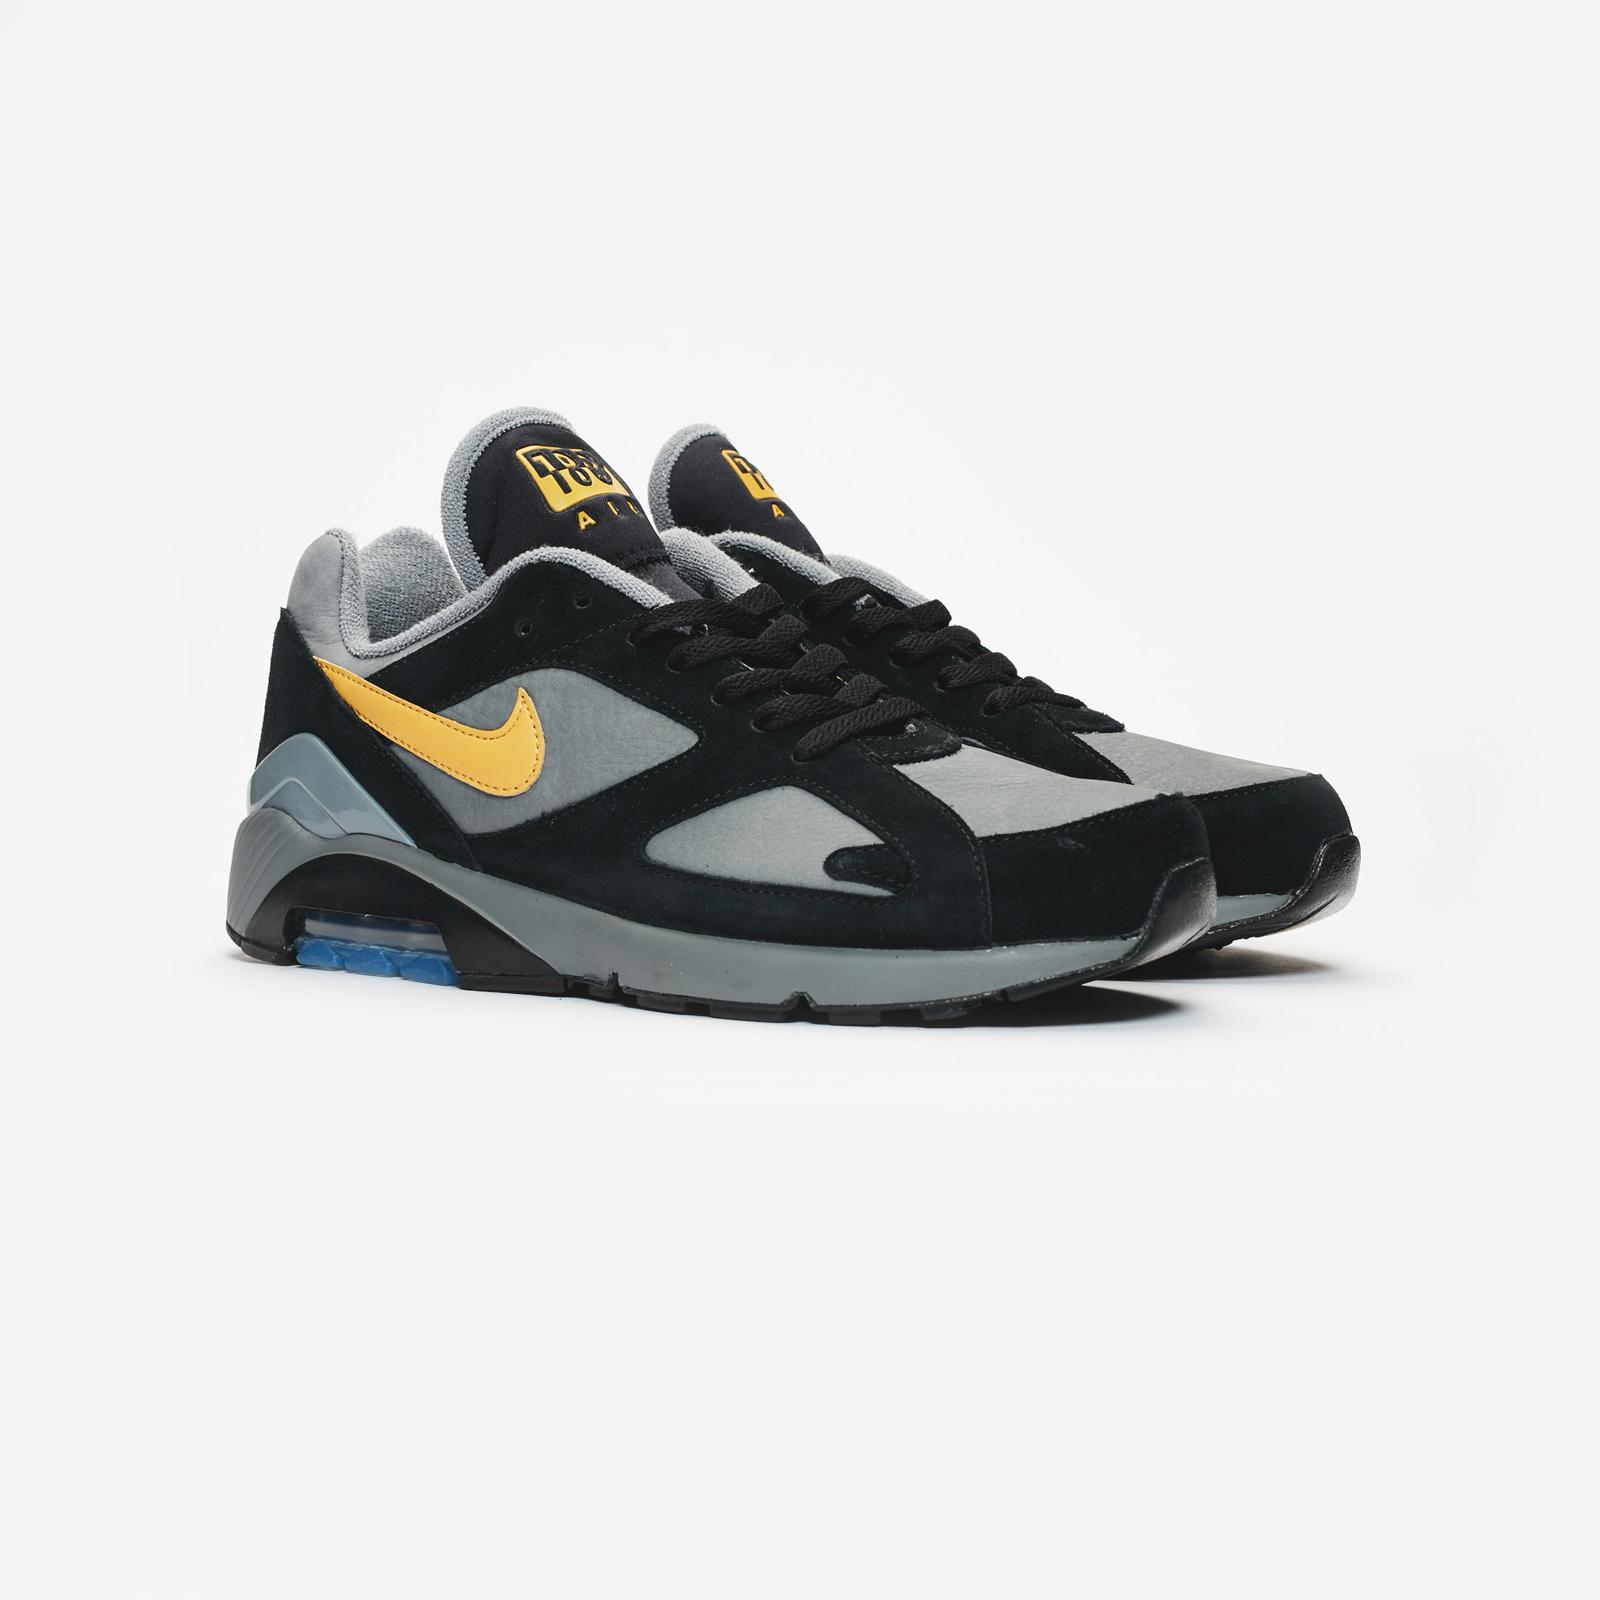 7b3d817fd48 Nike Air Max 180 - Av7023-001 - Sneakersnstuff